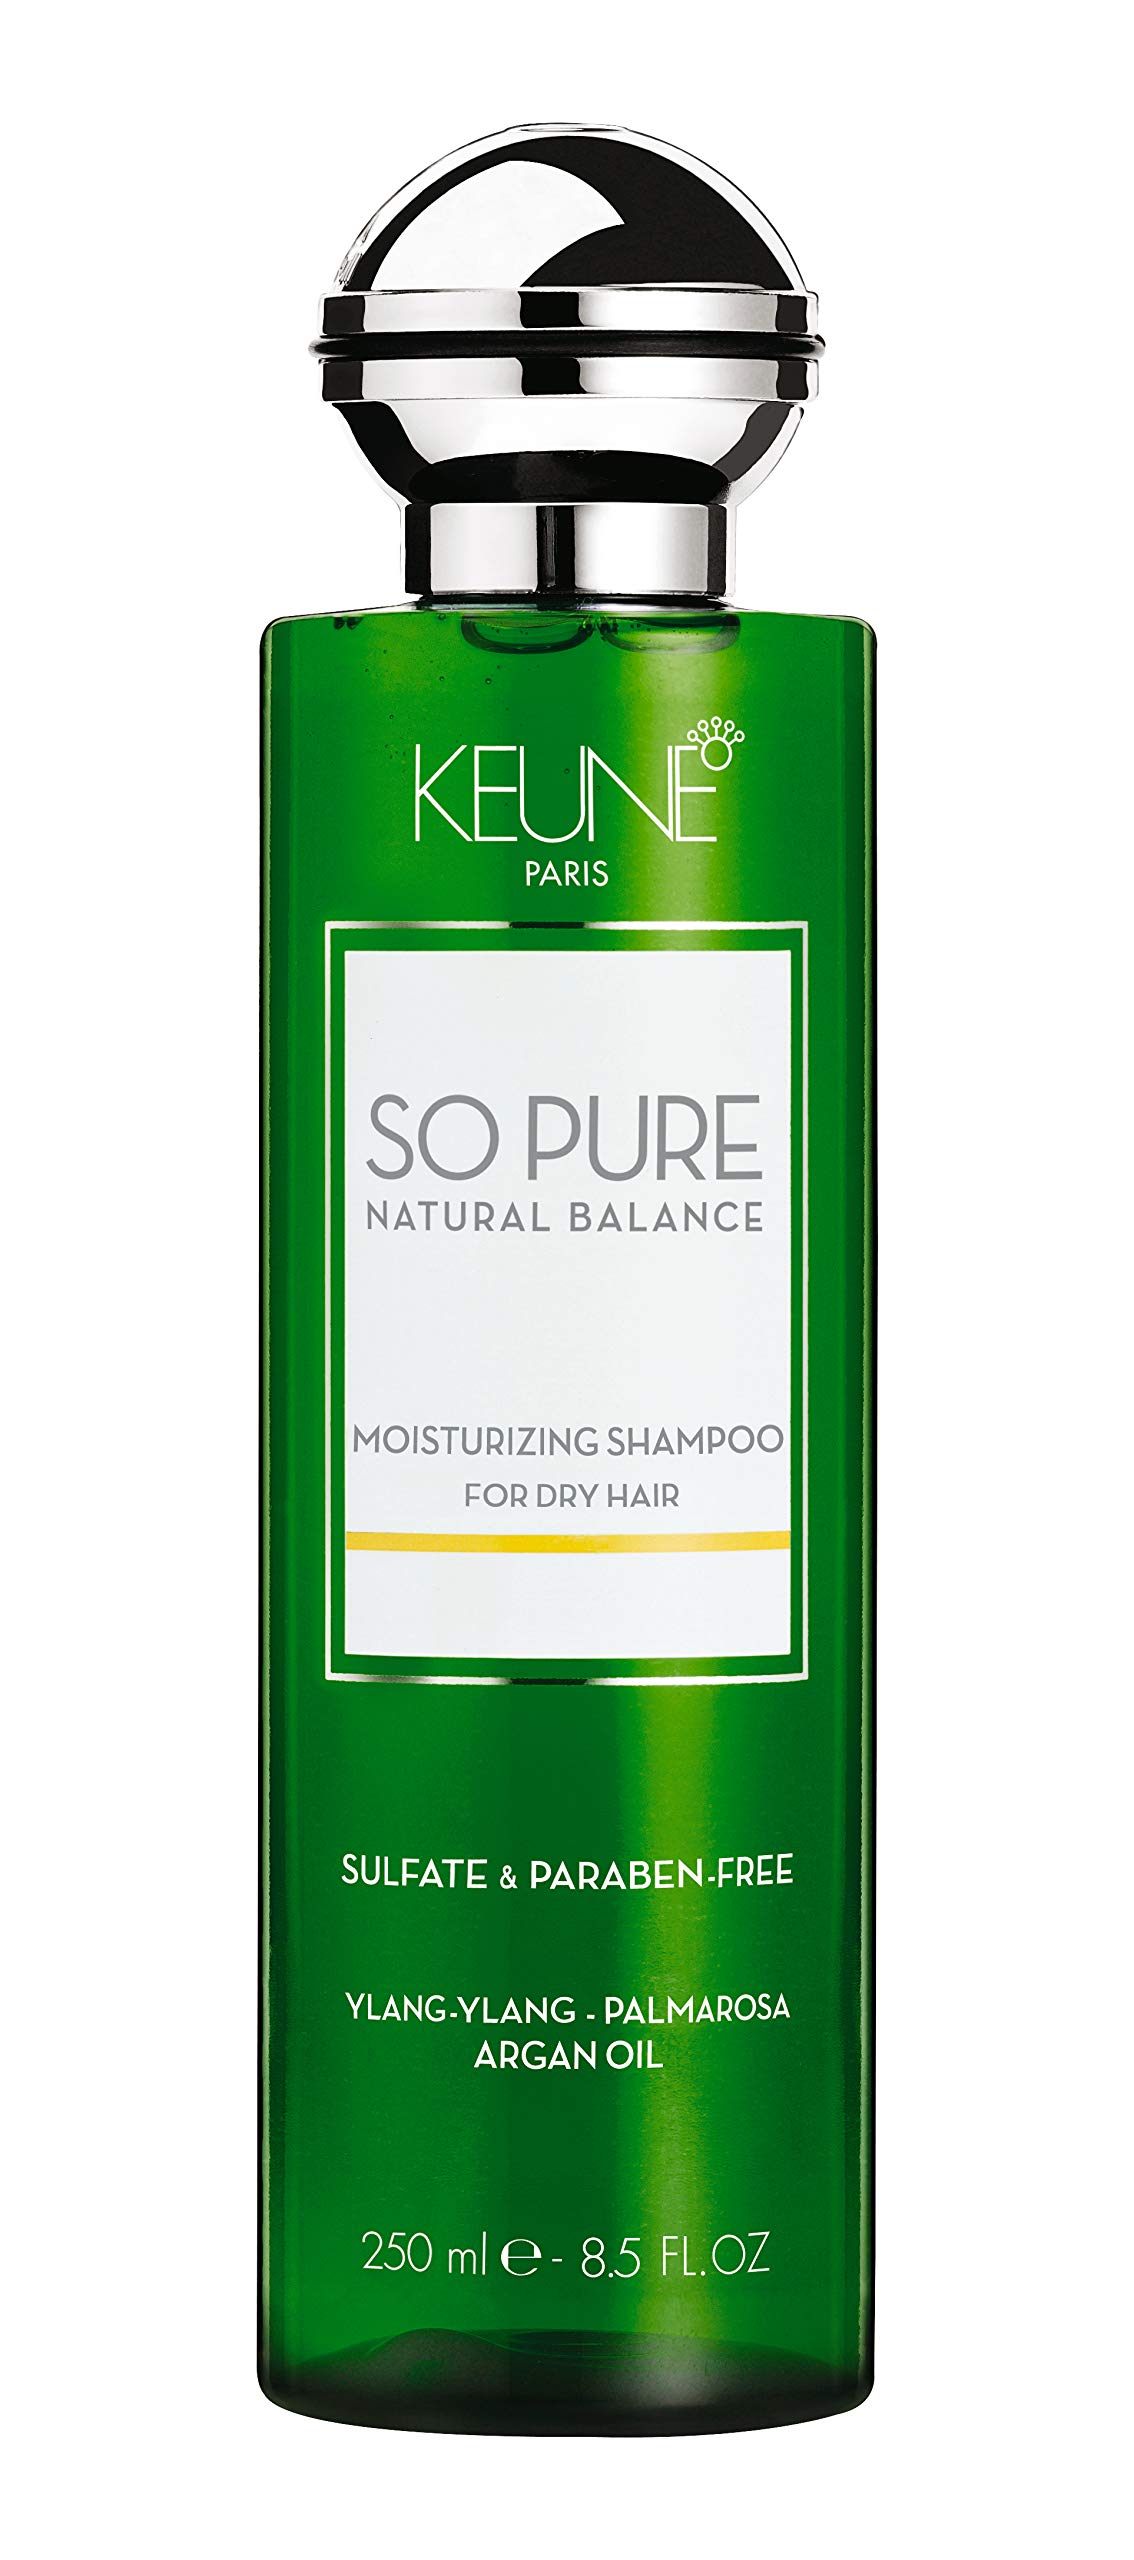 KEUNE So Pure Moisturizing Shampoo, 8.5 Fl Oz